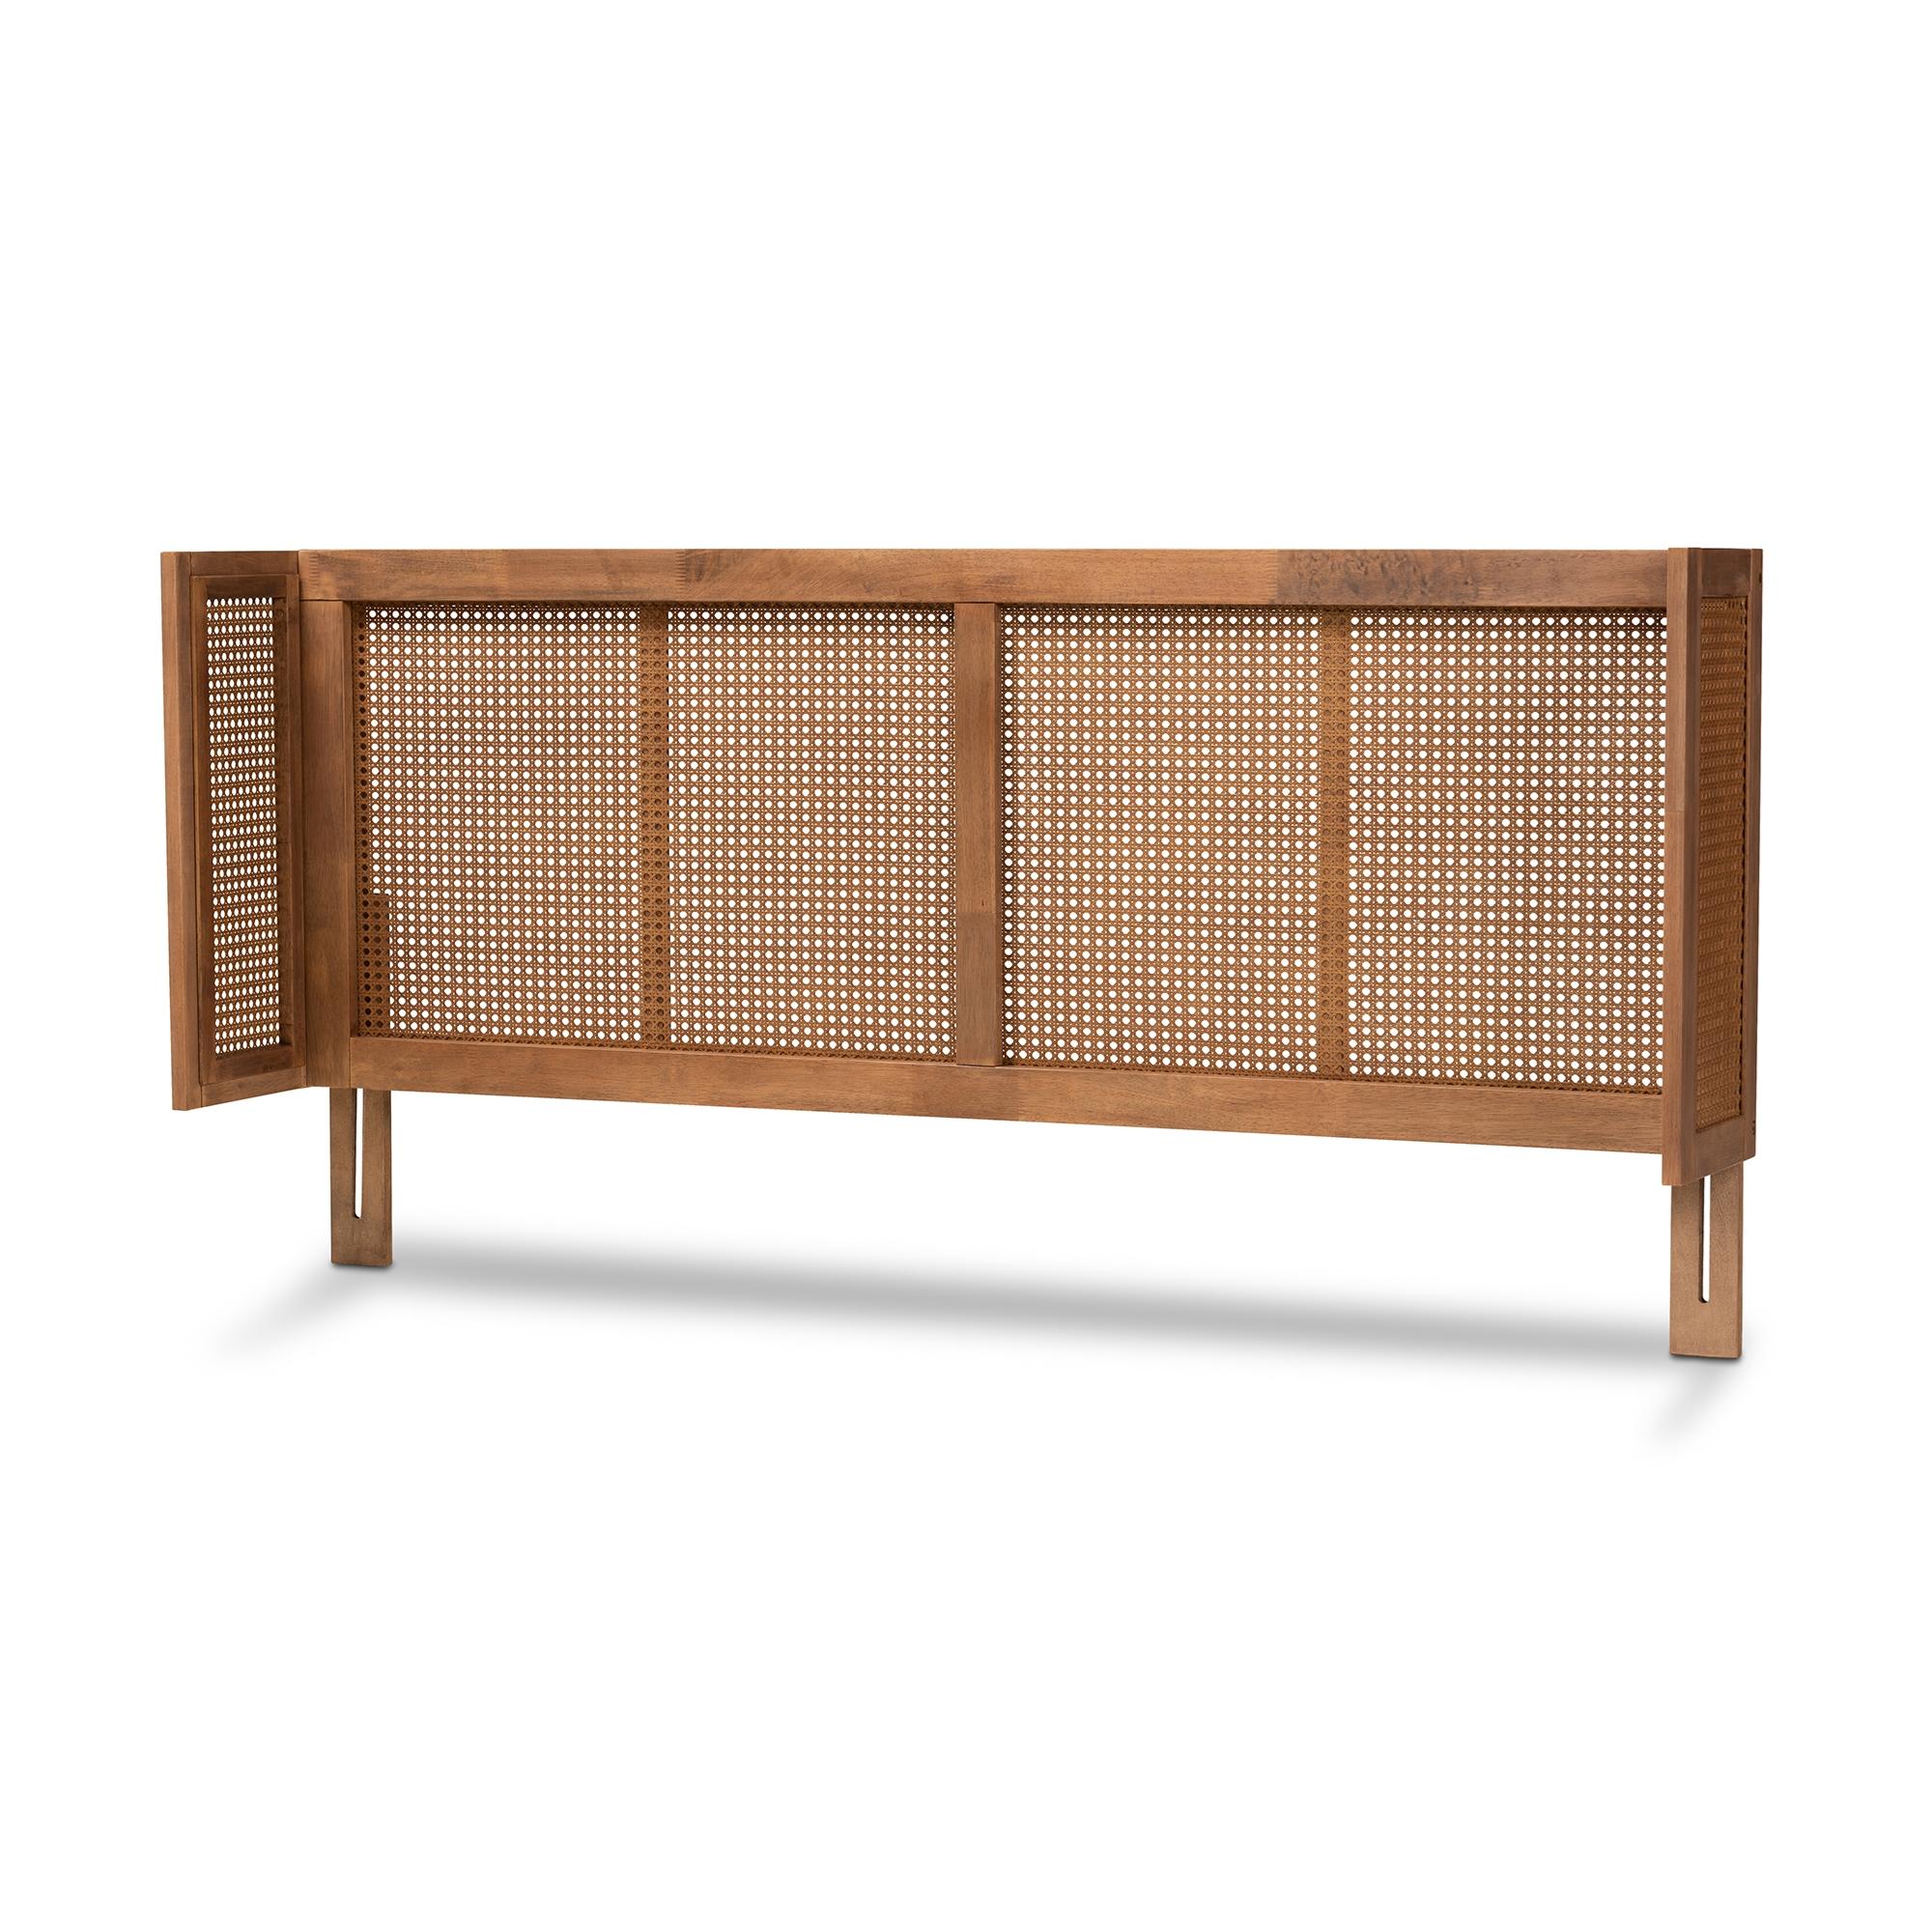 Wondrous Baxton Studio Rina Mid Century Modern Ash Wanut Finished Unemploymentrelief Wooden Chair Designs For Living Room Unemploymentrelieforg